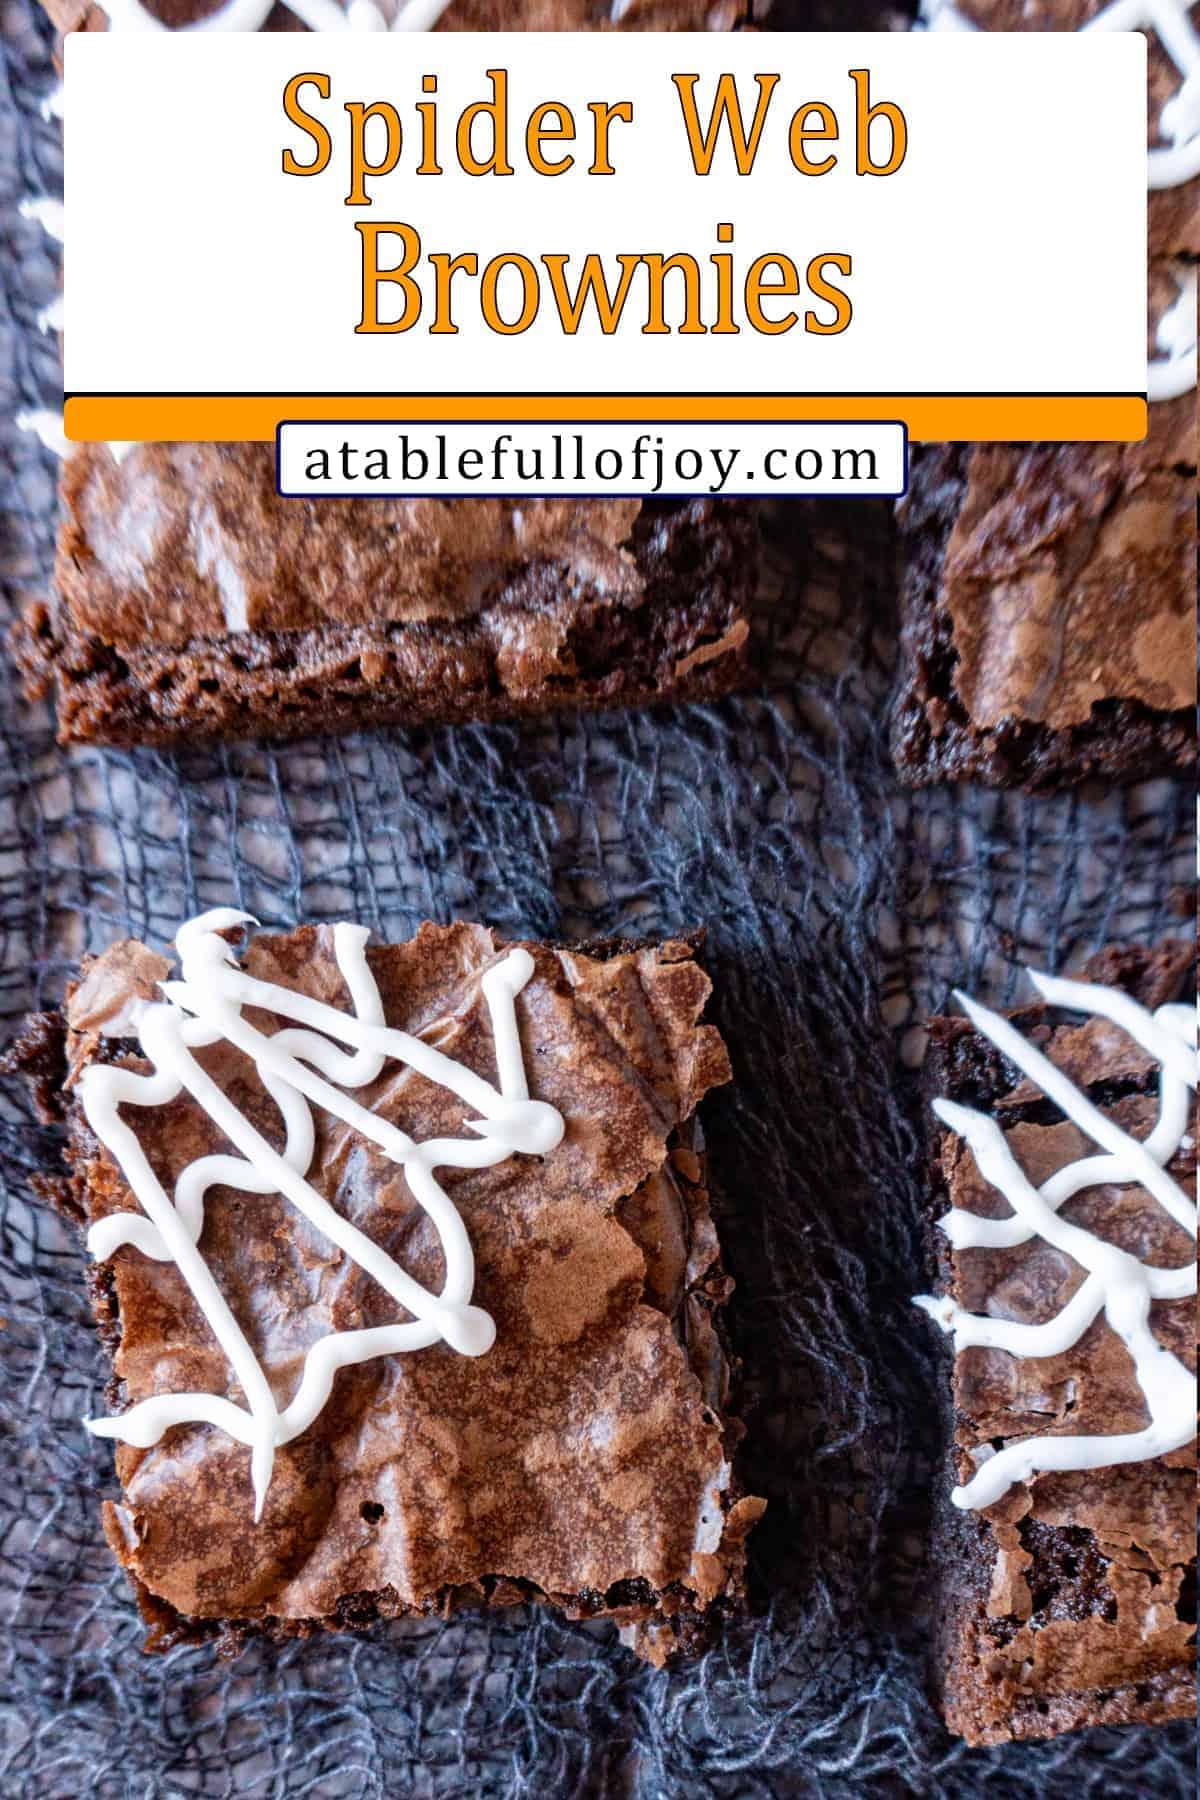 Spider Web Brownies pinterest pin